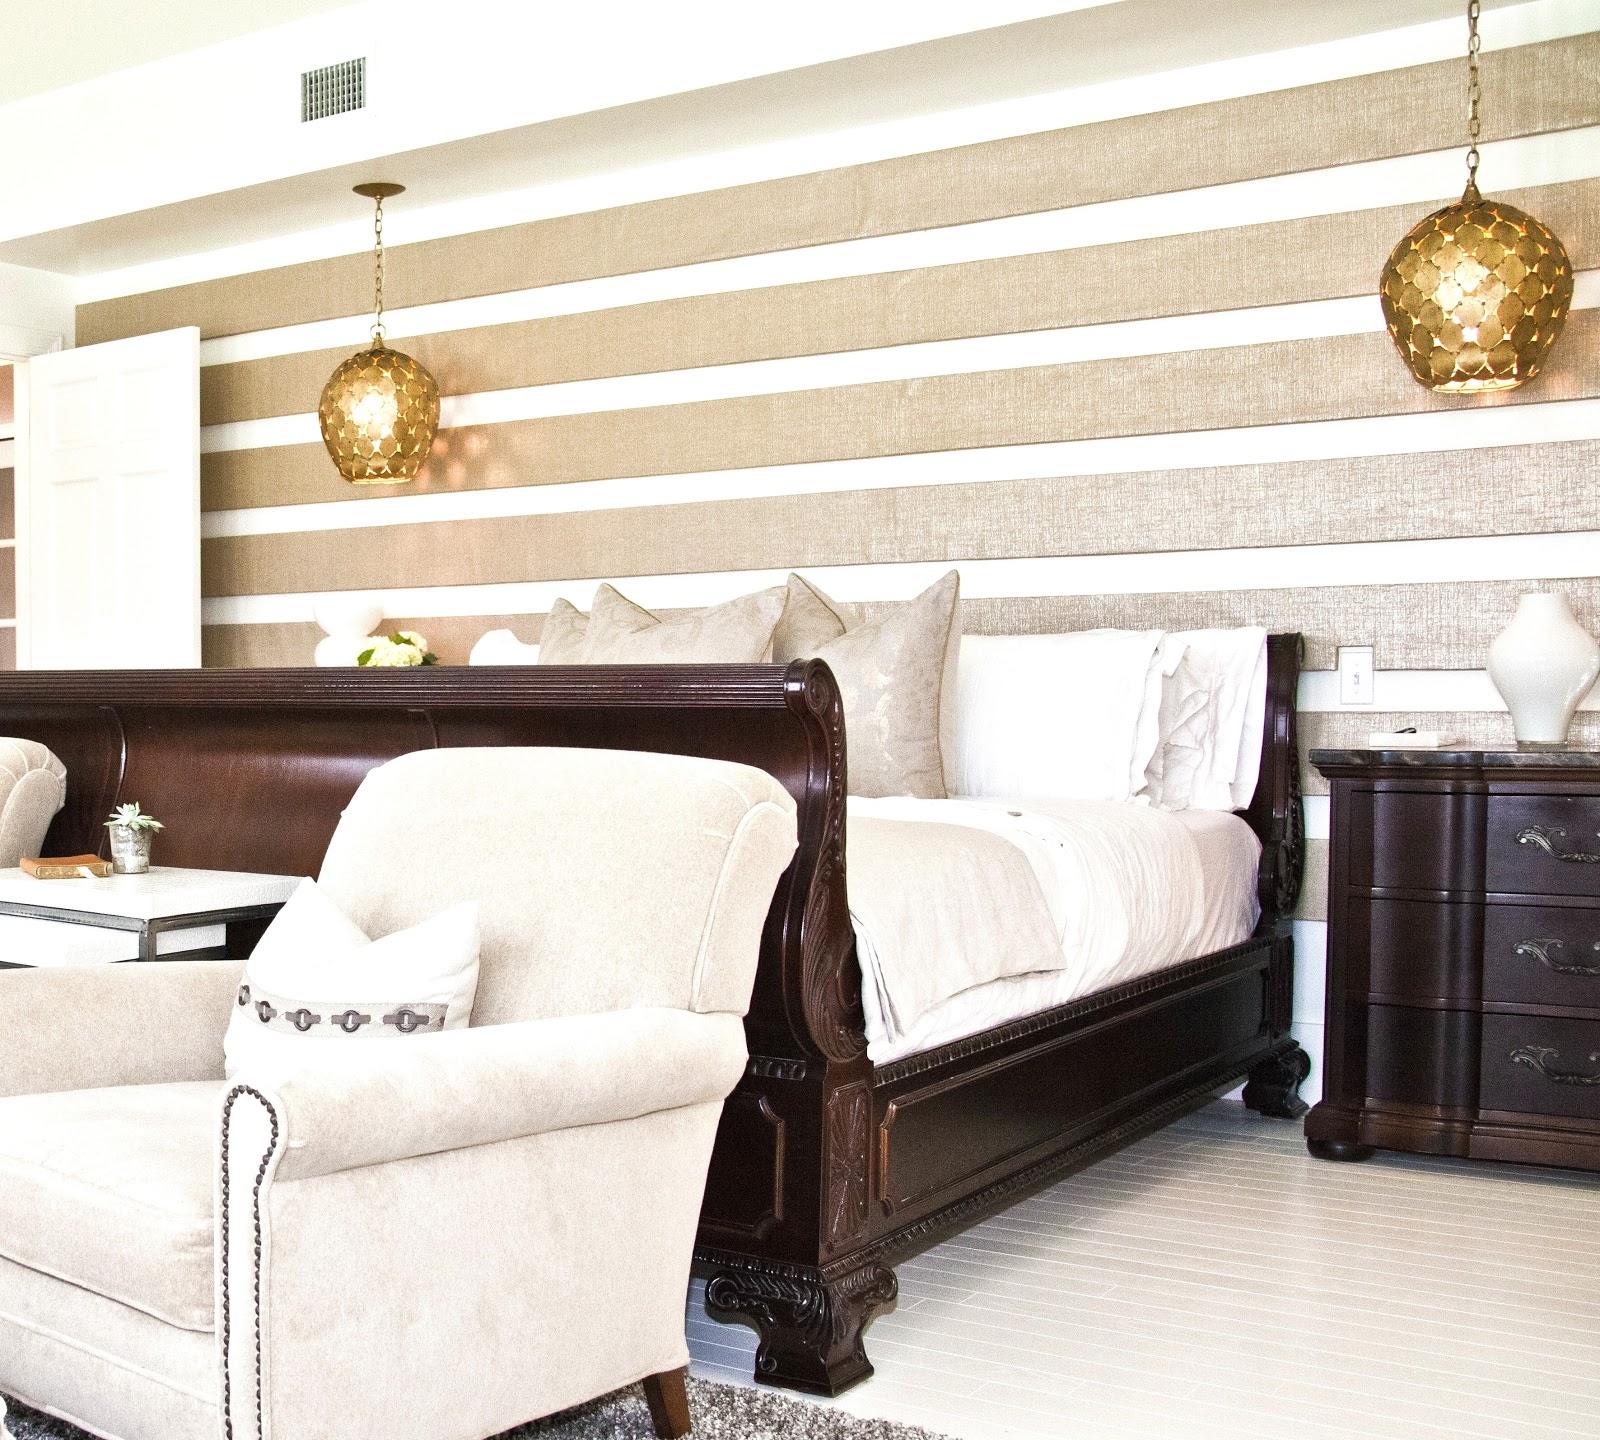 Modern Coastal Bedroom Ideas: Beach Chic Design: Coastal Chic Modern Bedroom Update